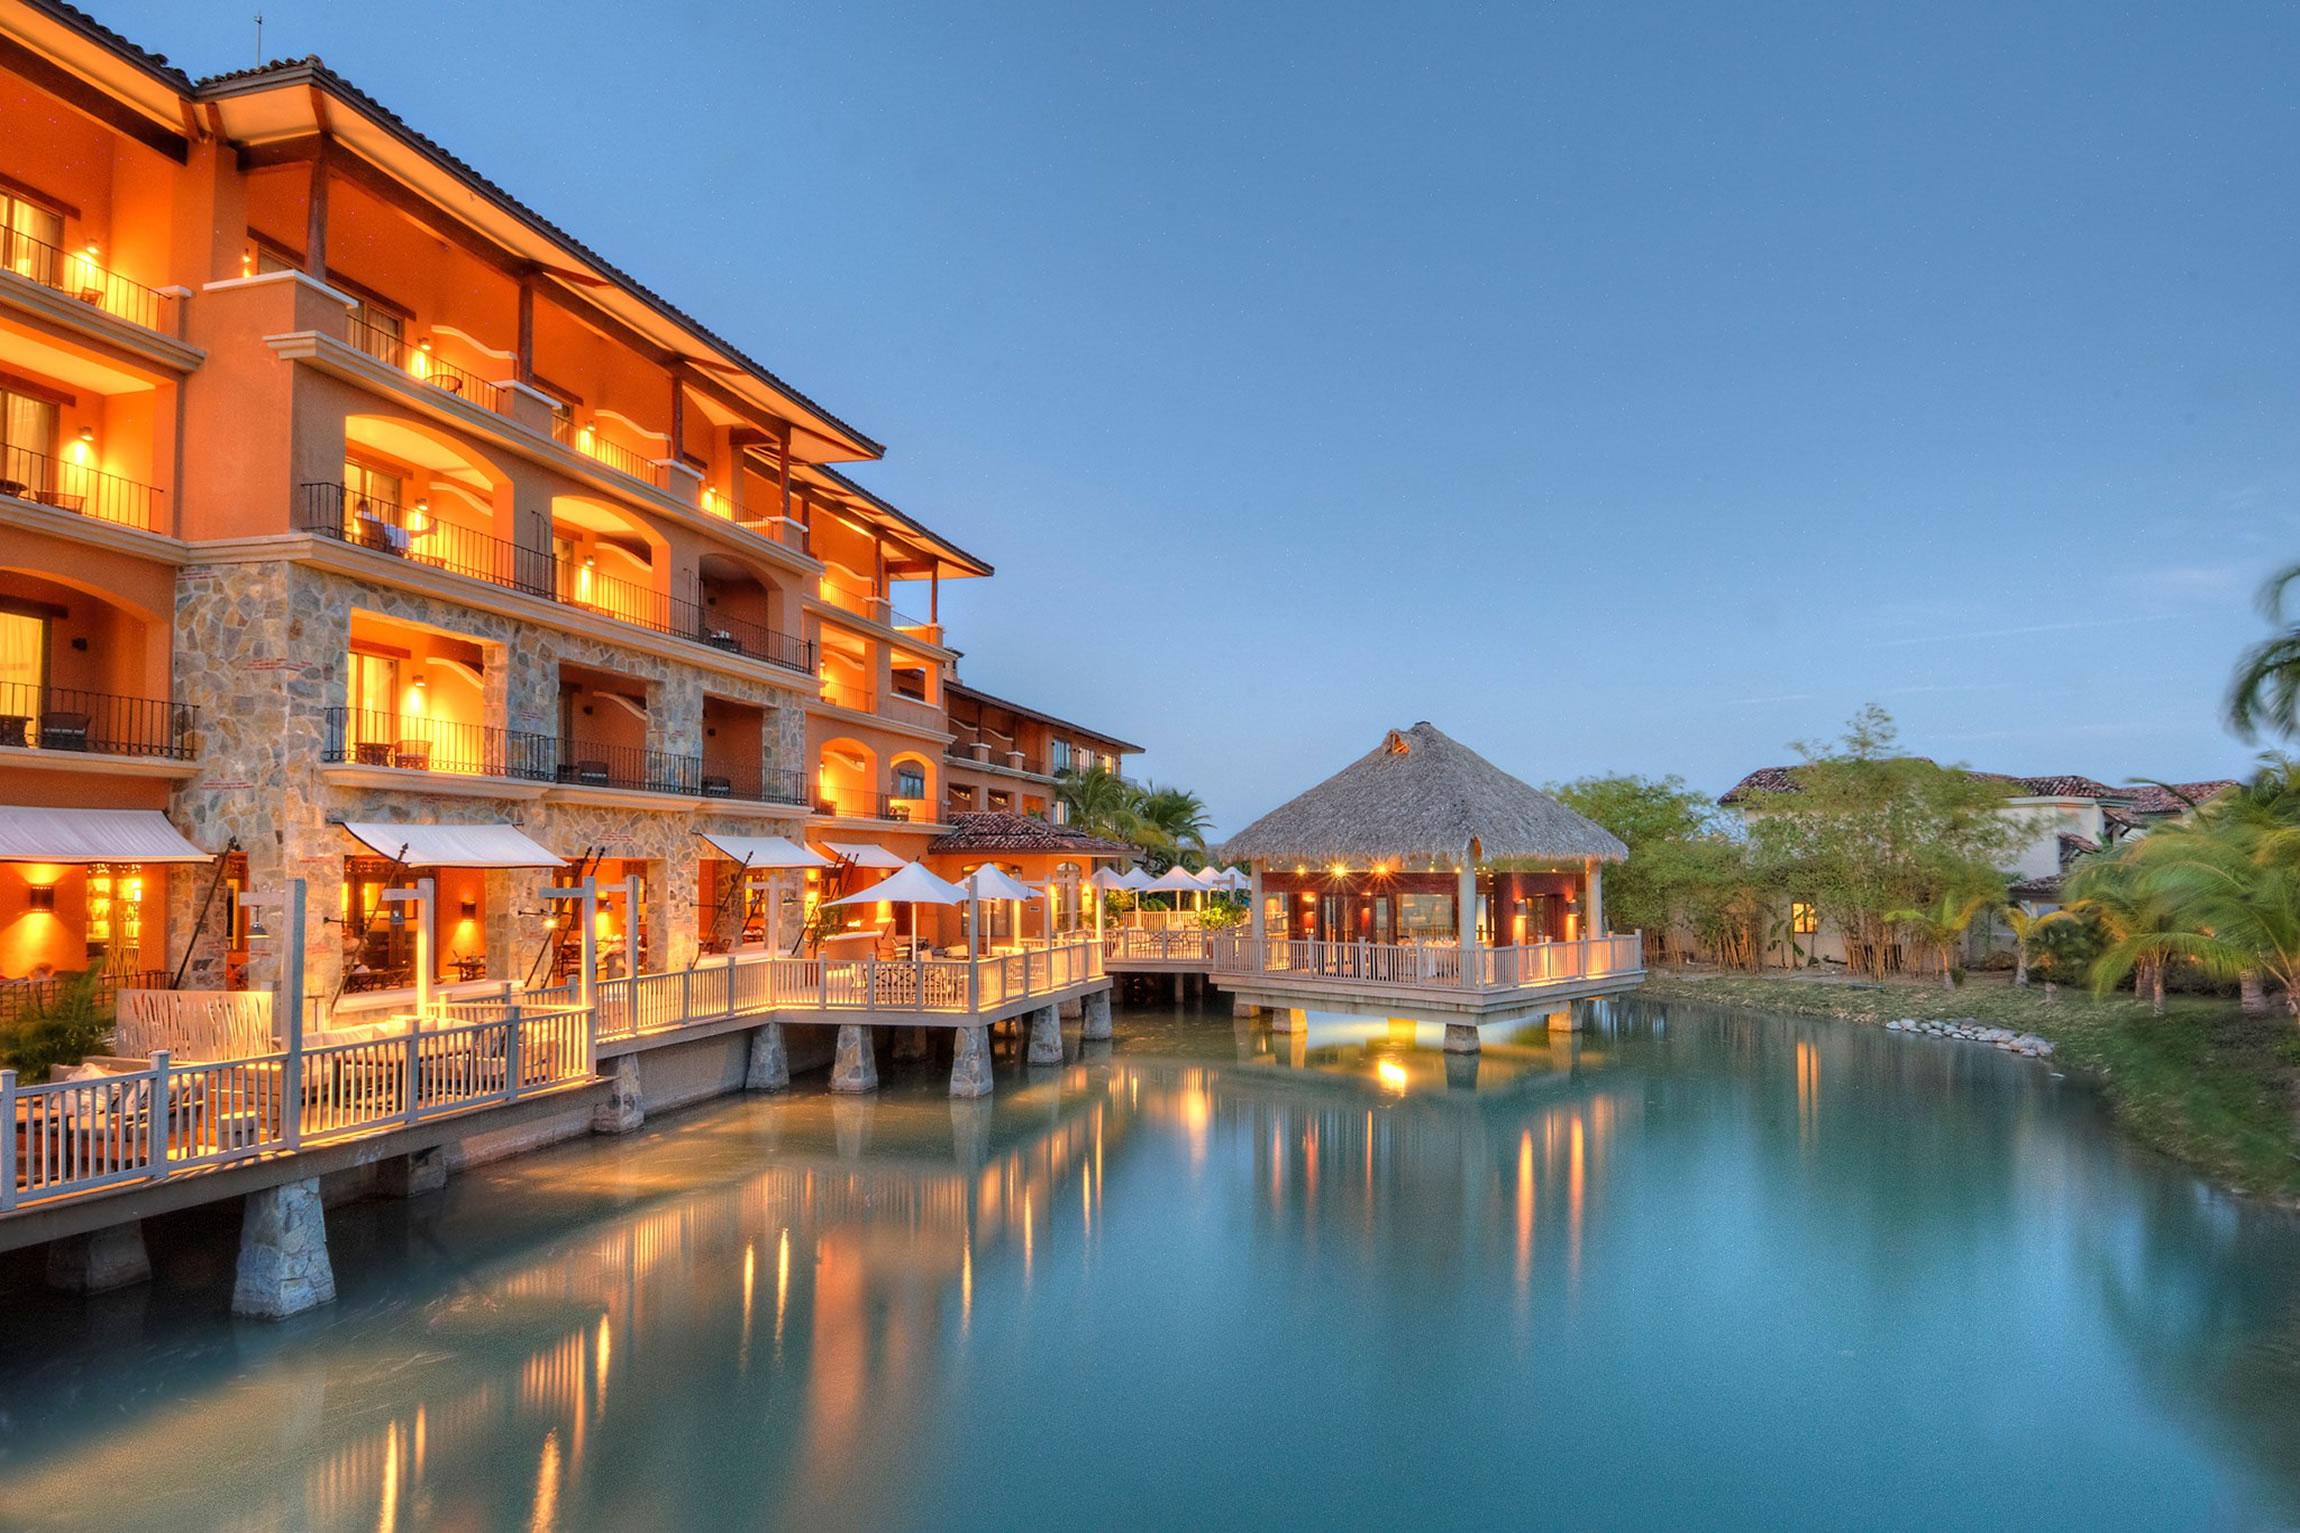 Panama-Wildlife-Tours-JW-Marriot-Golf-Beach-Resort_Exterior-02